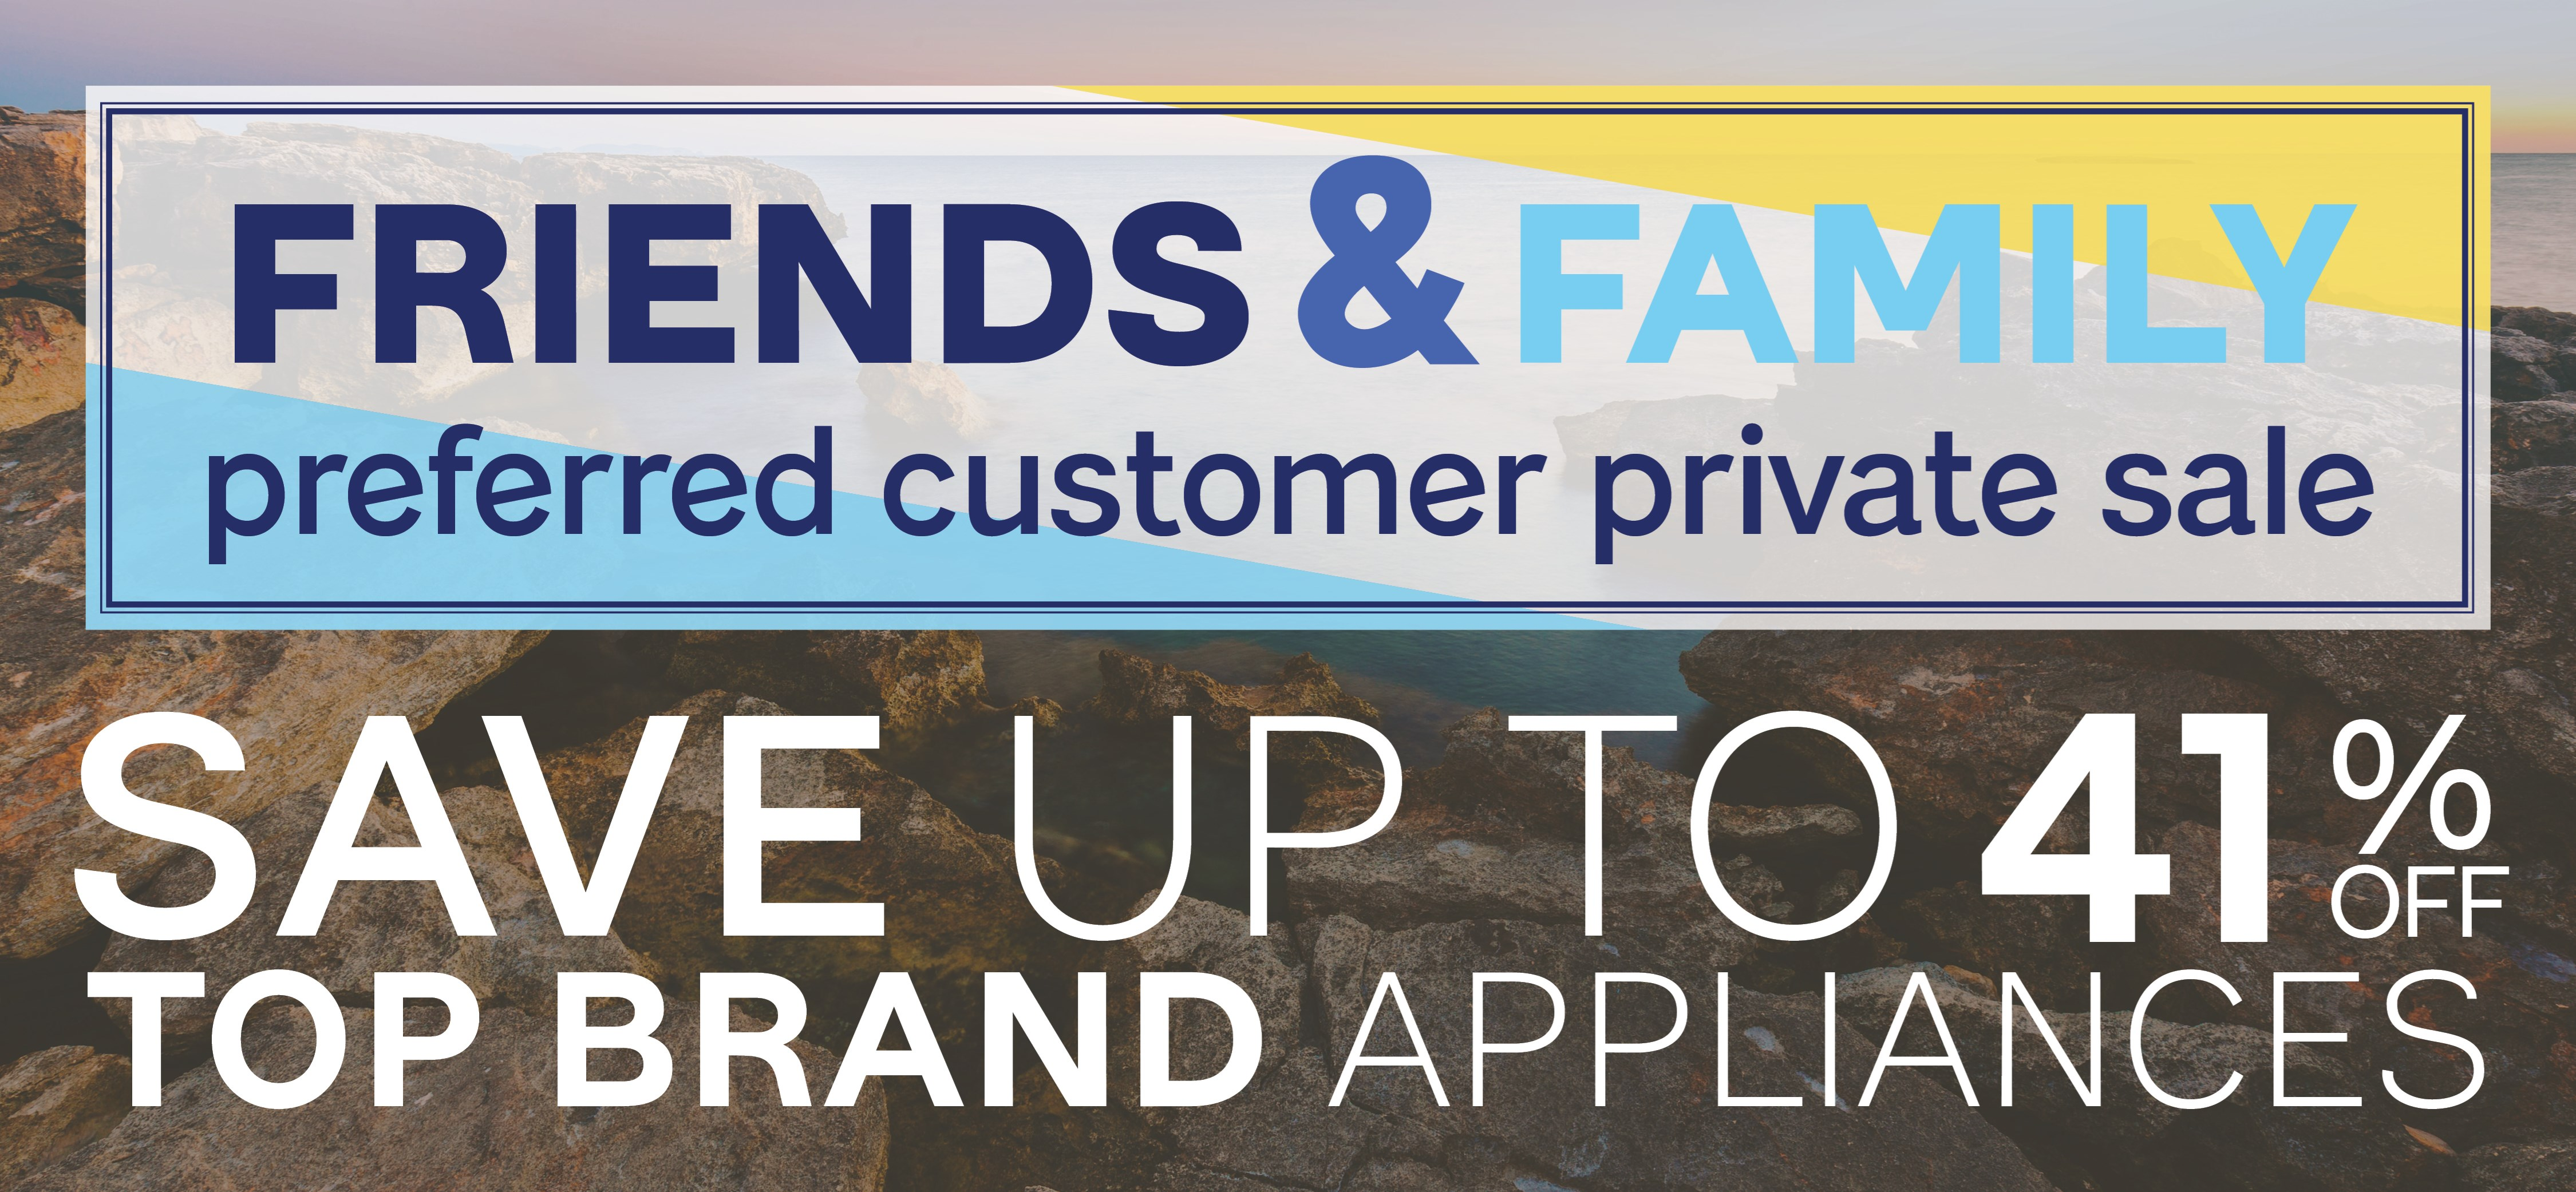 Furniture & ApplianceMart Friends & Family Sale